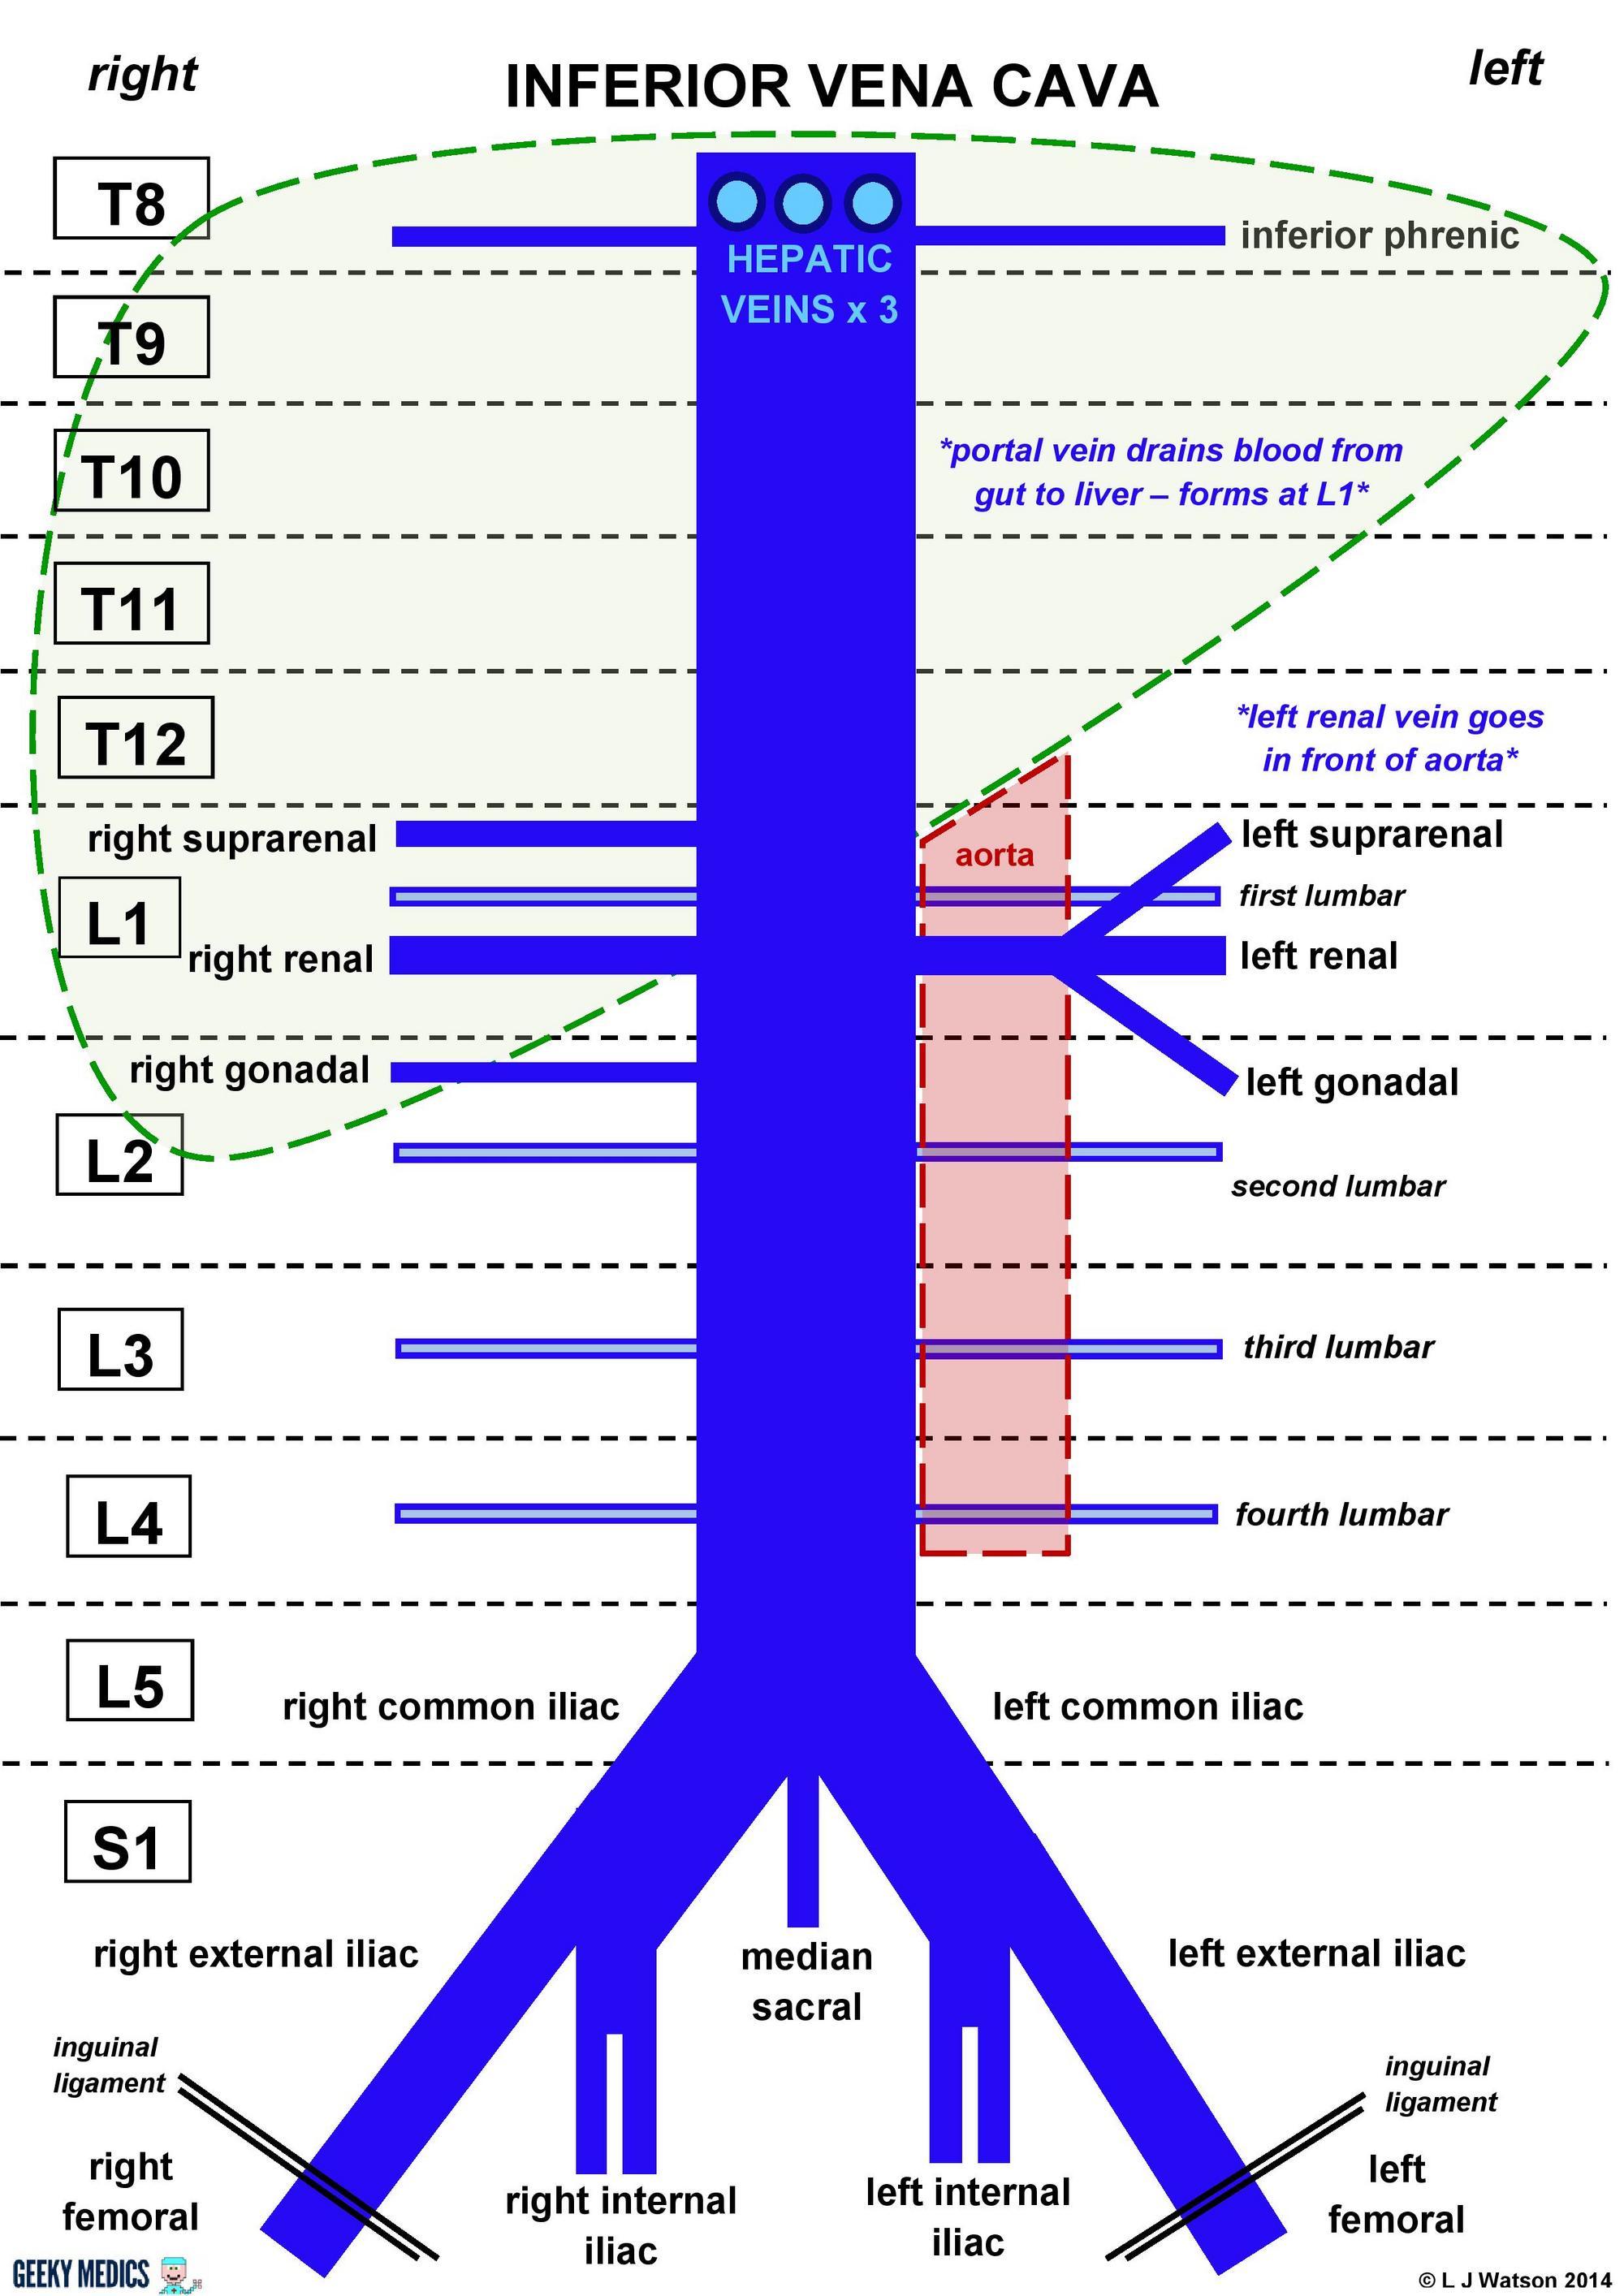 Abdomen:Venous:IVC and tributaries | RANZCRPart1 Wiki | FANDOM ...